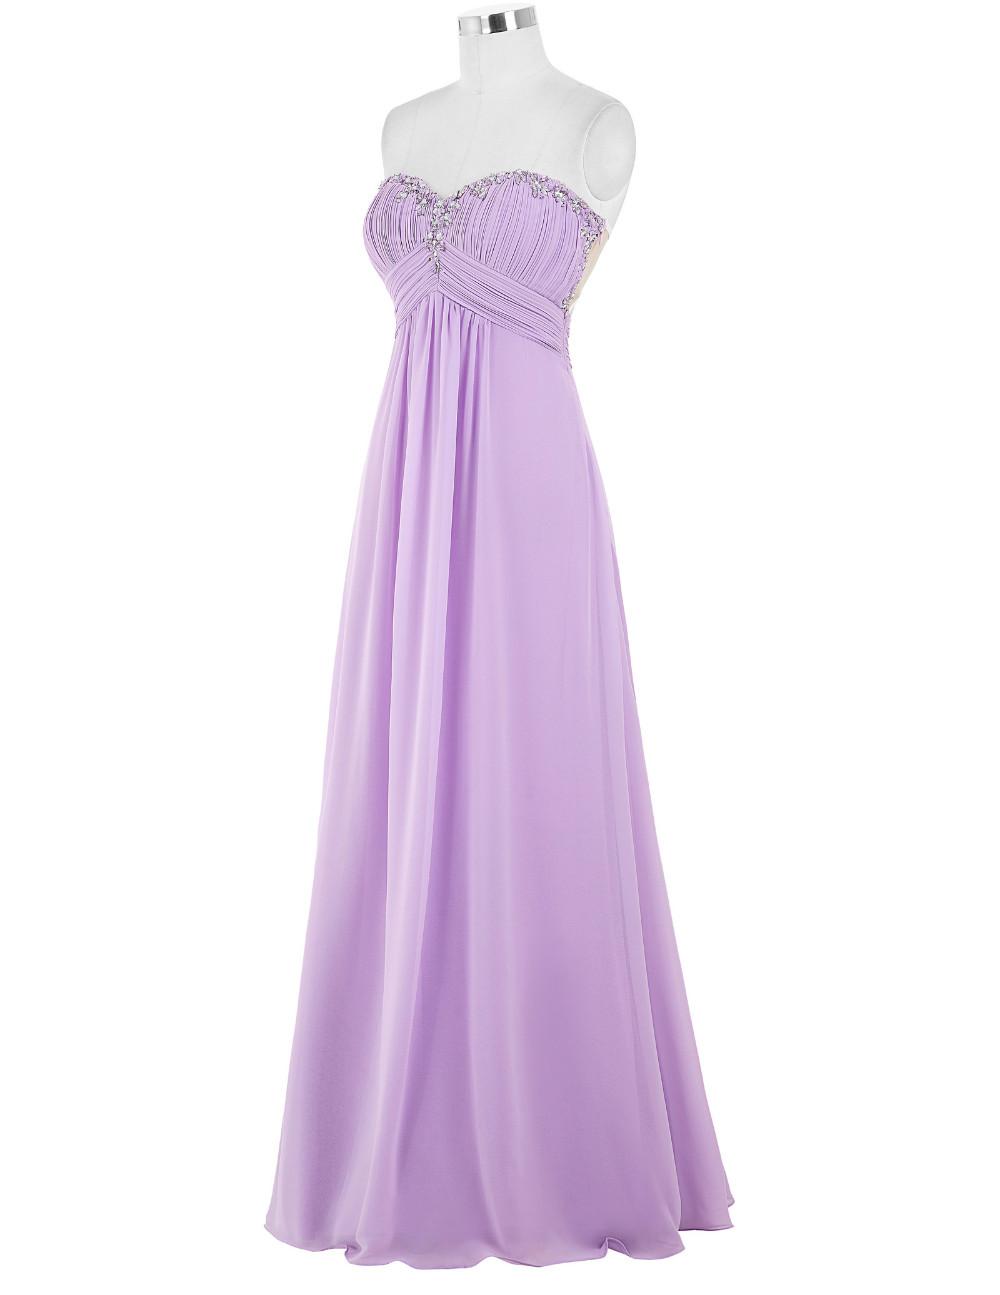 Lavender Green Blue Bridesmaid Dresses Long Wedding Party Dress Bruidsmeisjes Jurk Chiffon Gelinlik Prom Dresses for Bridesmaids 6